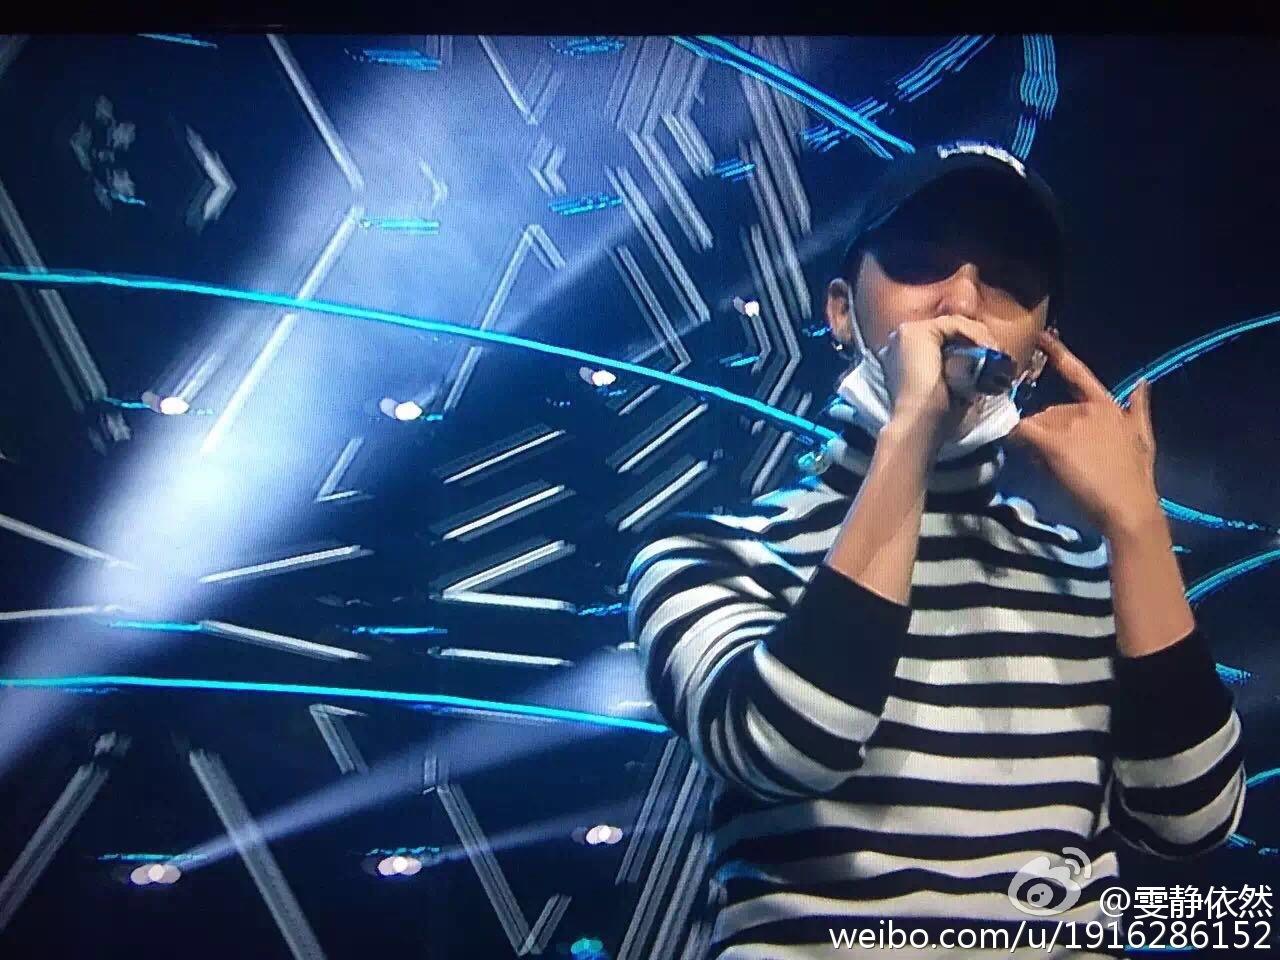 BIGBANG Rehearsals Hunan TV 31-12-2015 (1)